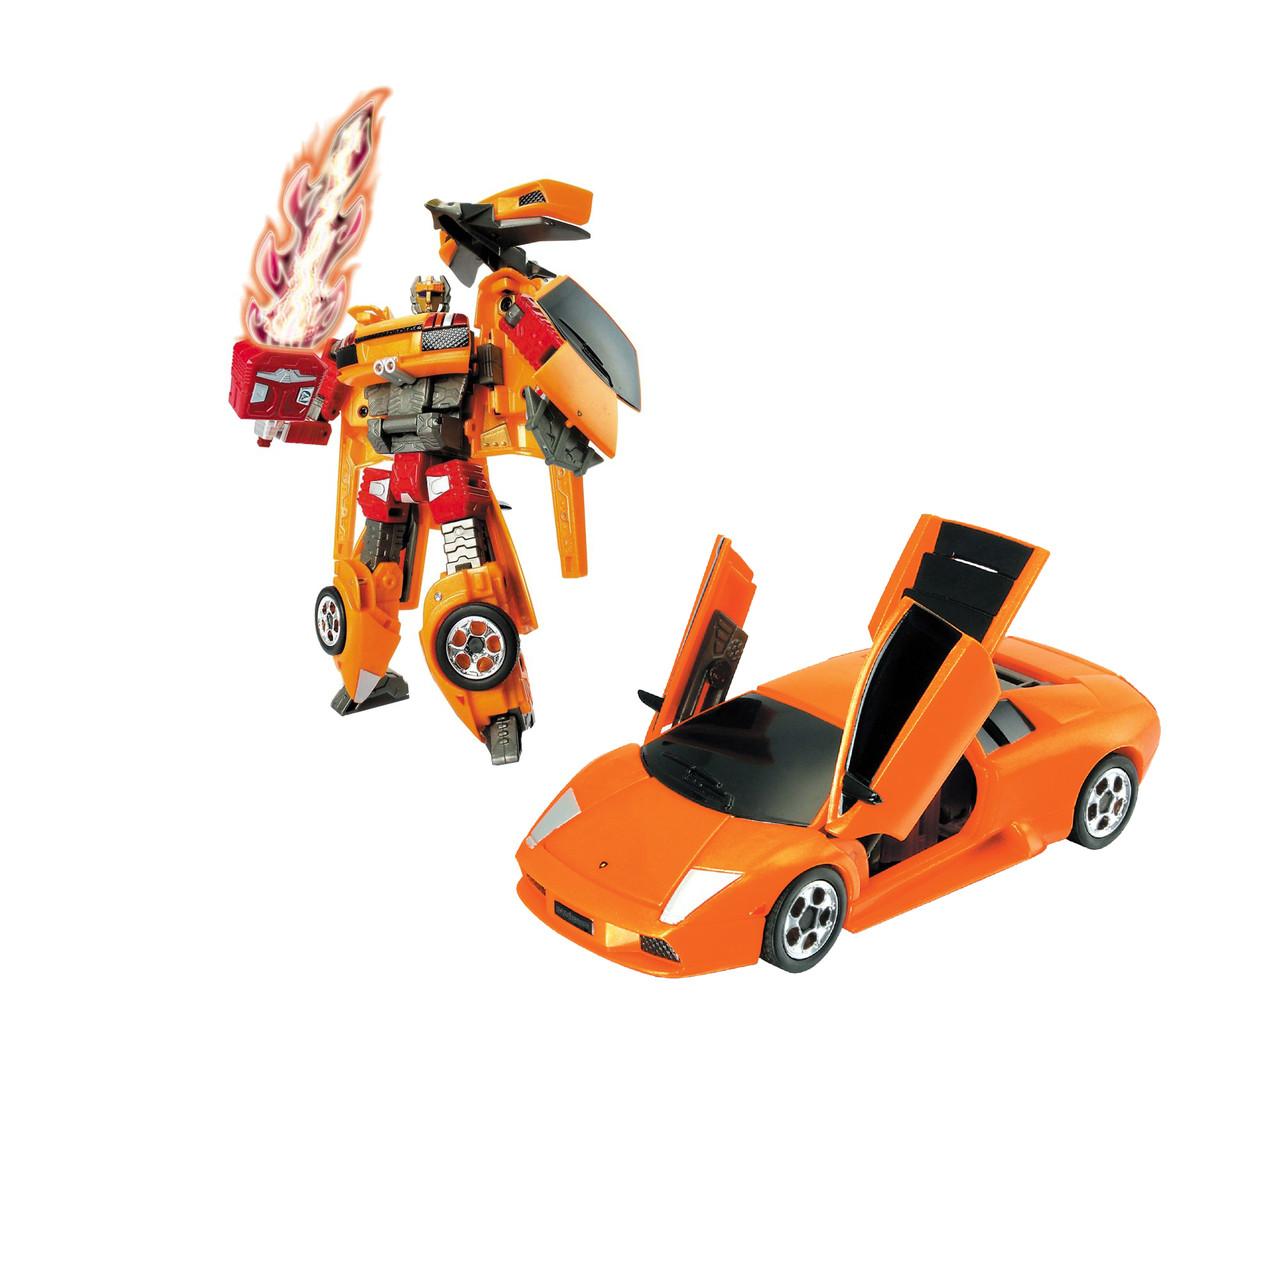 Робот трансформер Roadbot - Lamborghini Murcielago 1:32 (52010 r)